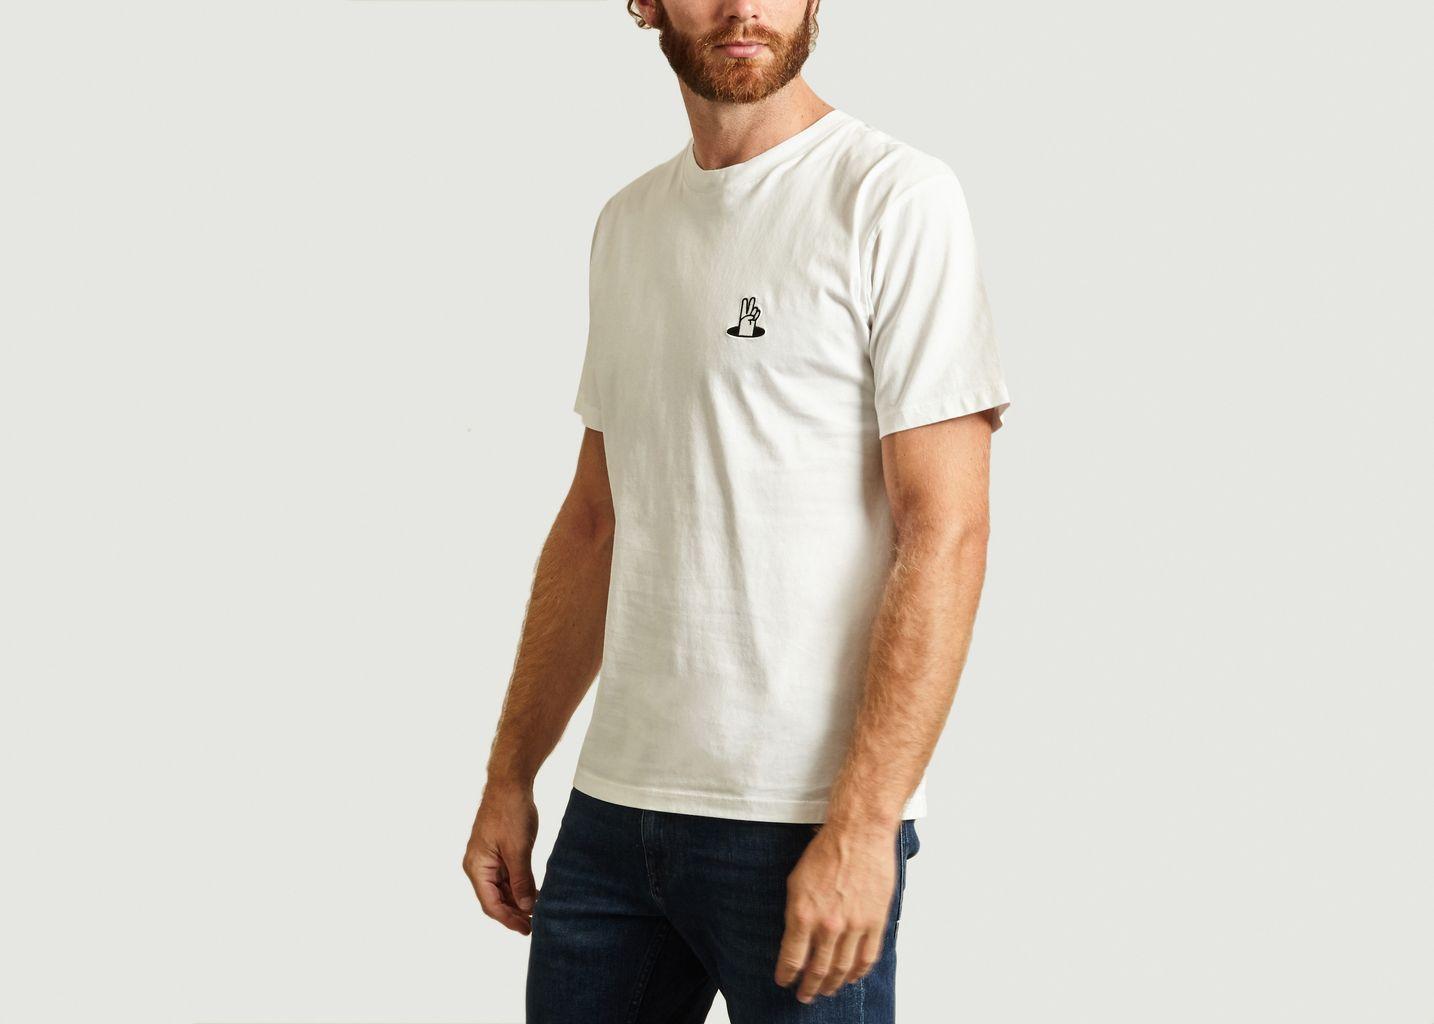 T-shirt Victoria - Loreak Mendian